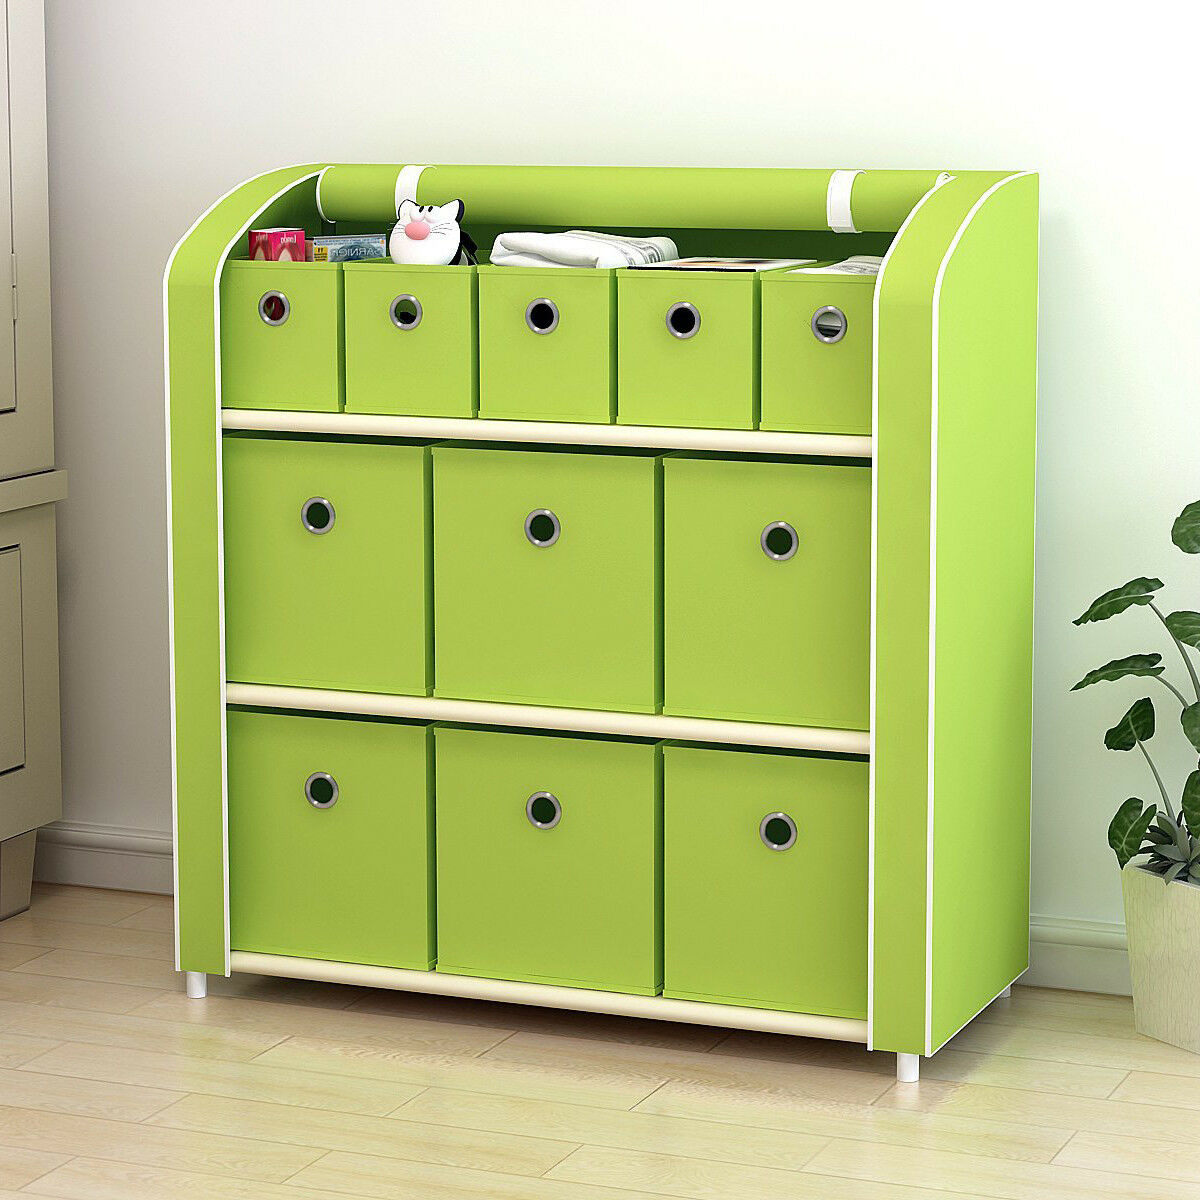 11 Drawers Storage Shelf  Storage Chest Closet Cabinet with